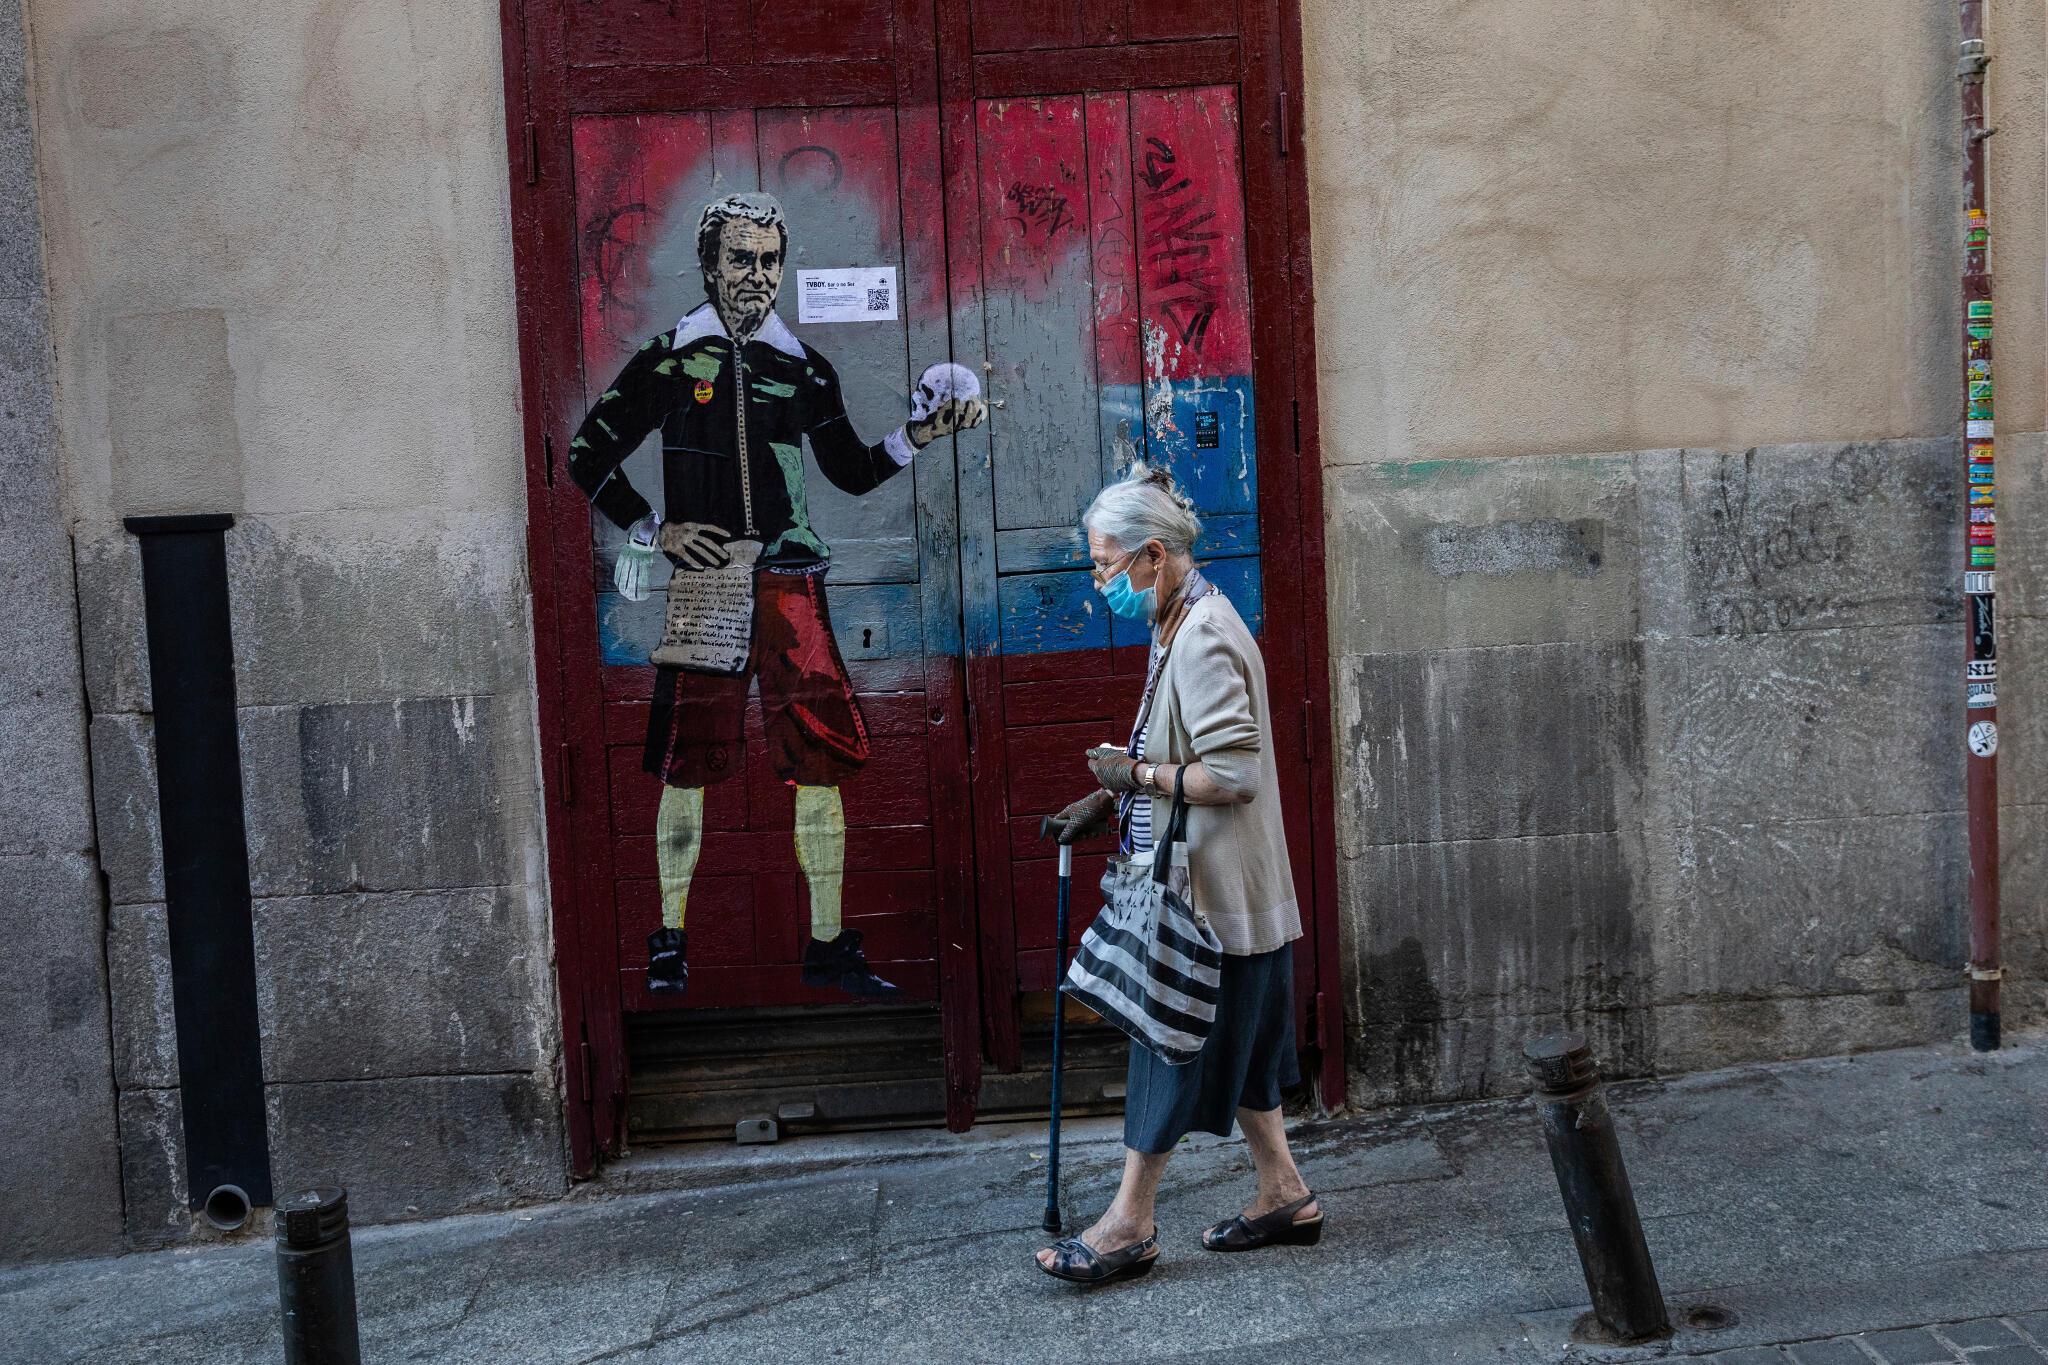 Le nombre de cas de coronavirus augmente en Espagne.